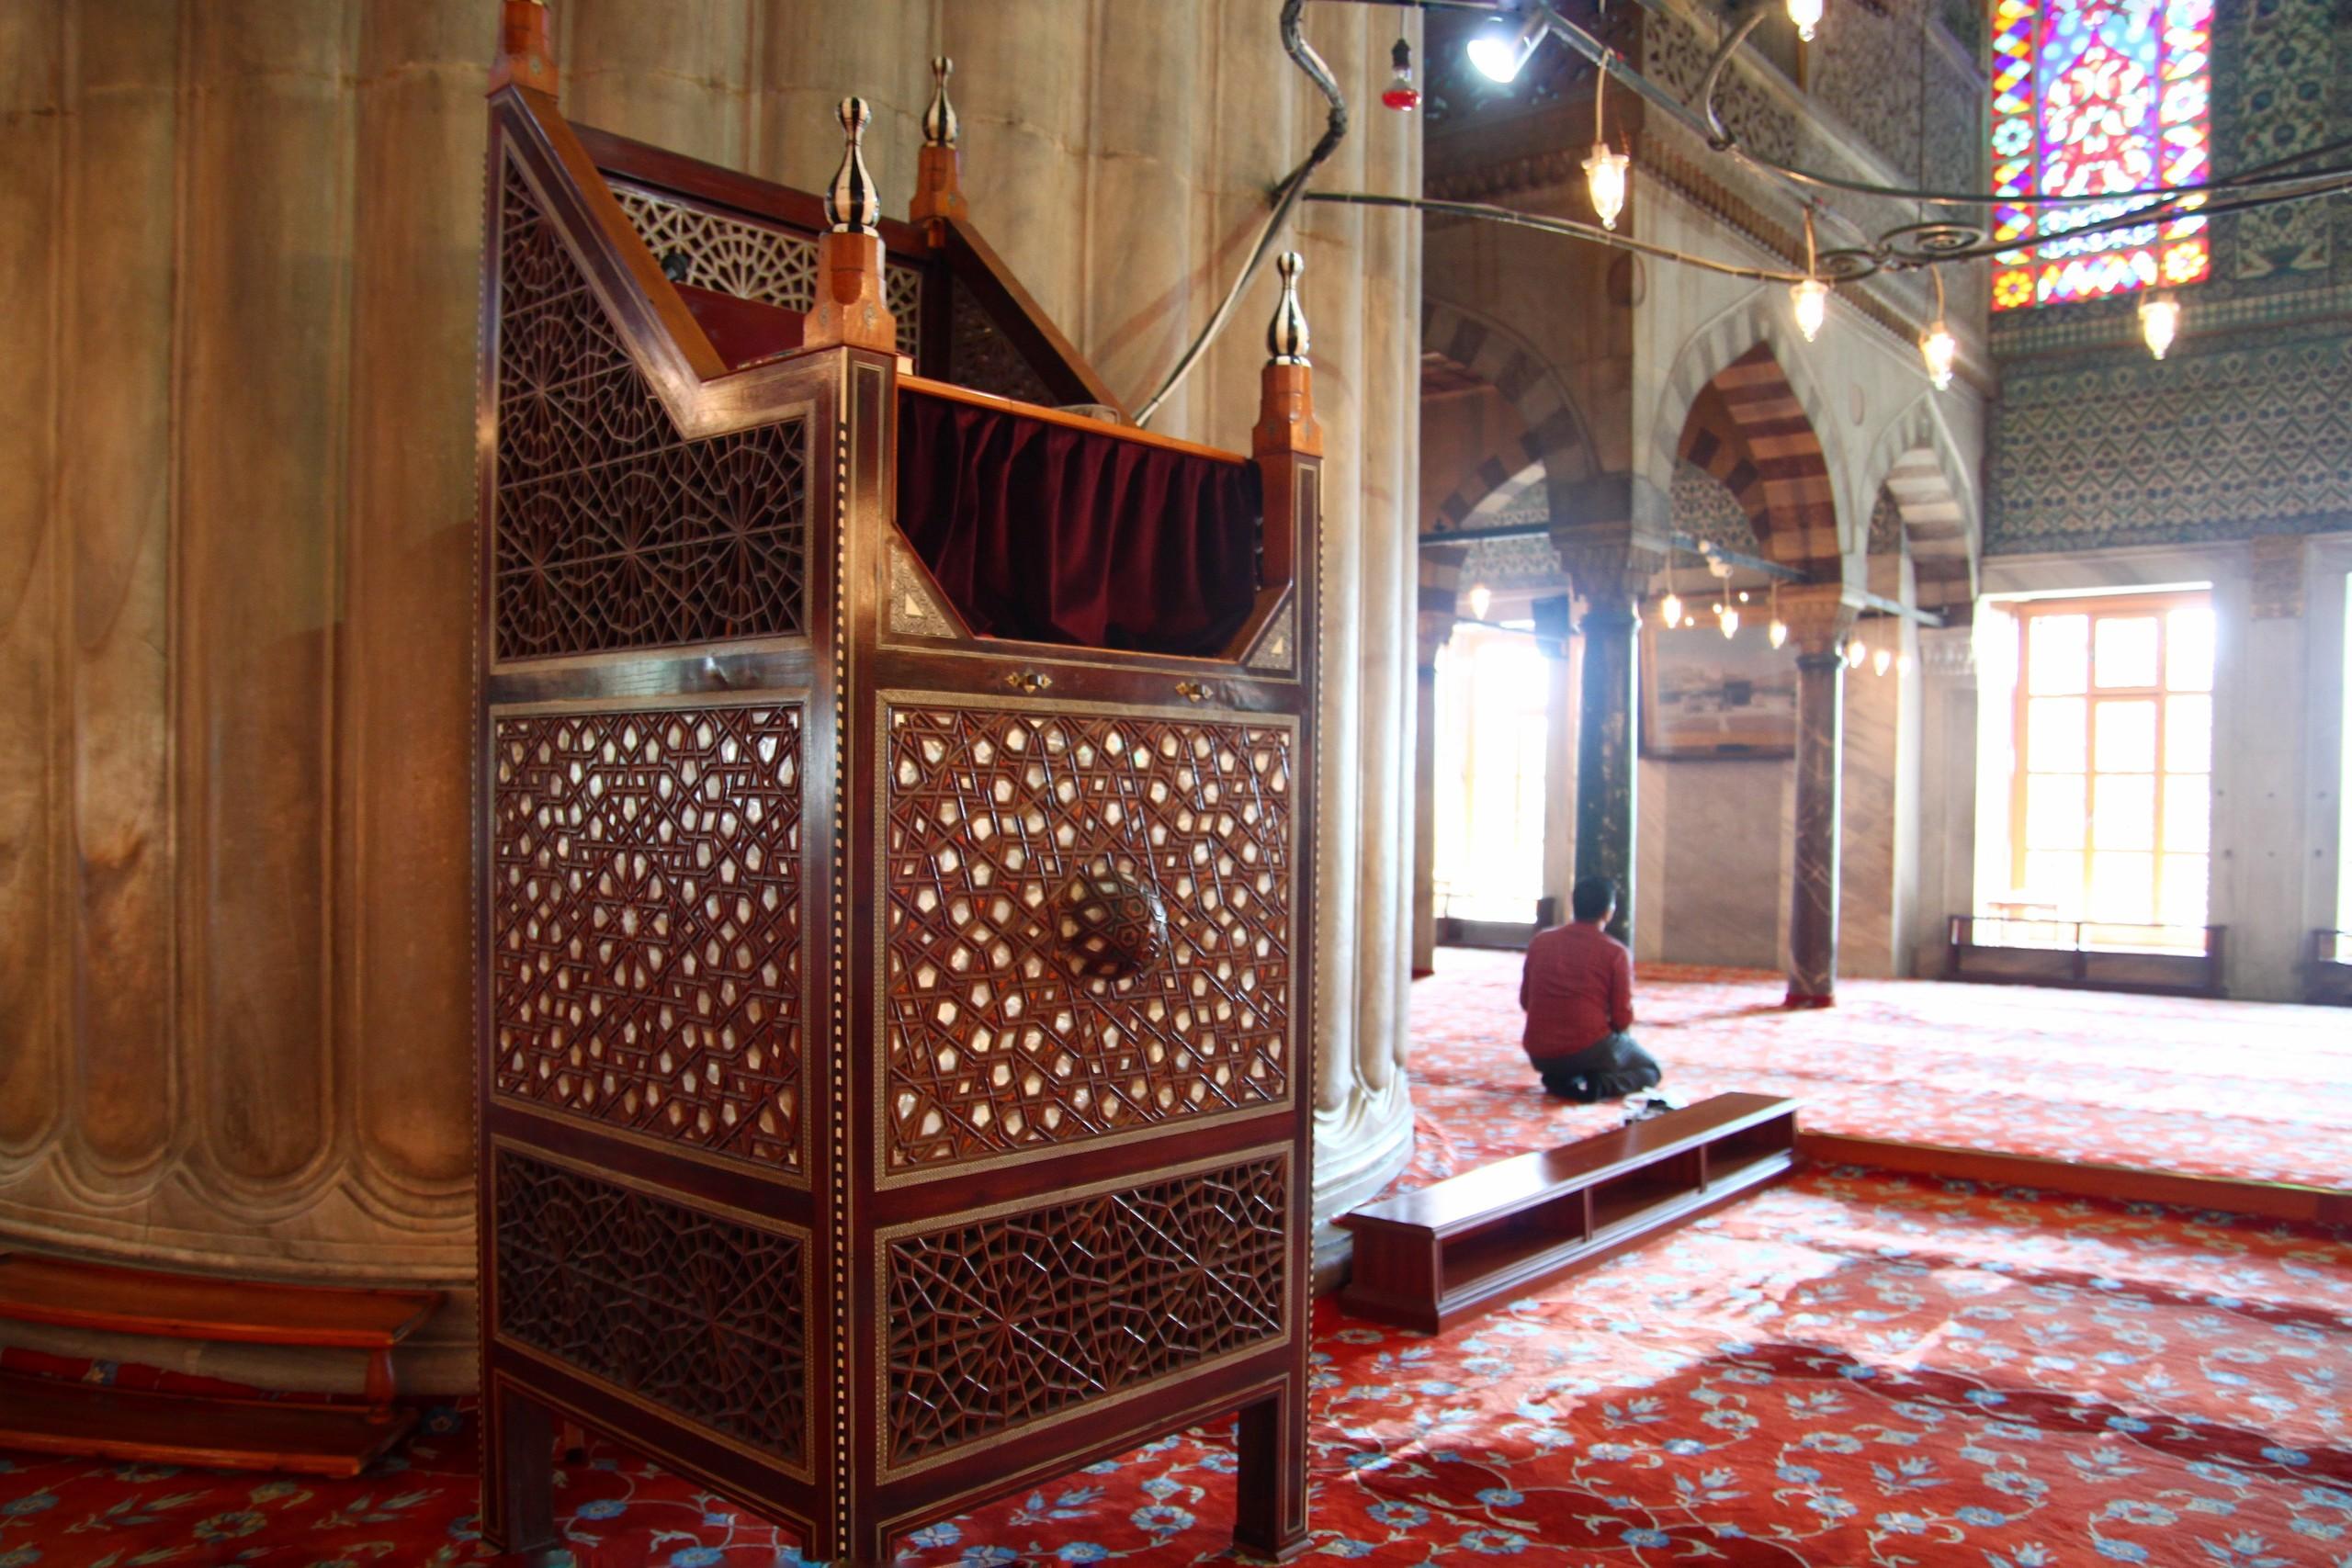 Pırlantadan Kubbeler #5: Sultanahmed - v4AW7p - Pırlantadan Kubbeler #5: Sultanahmed